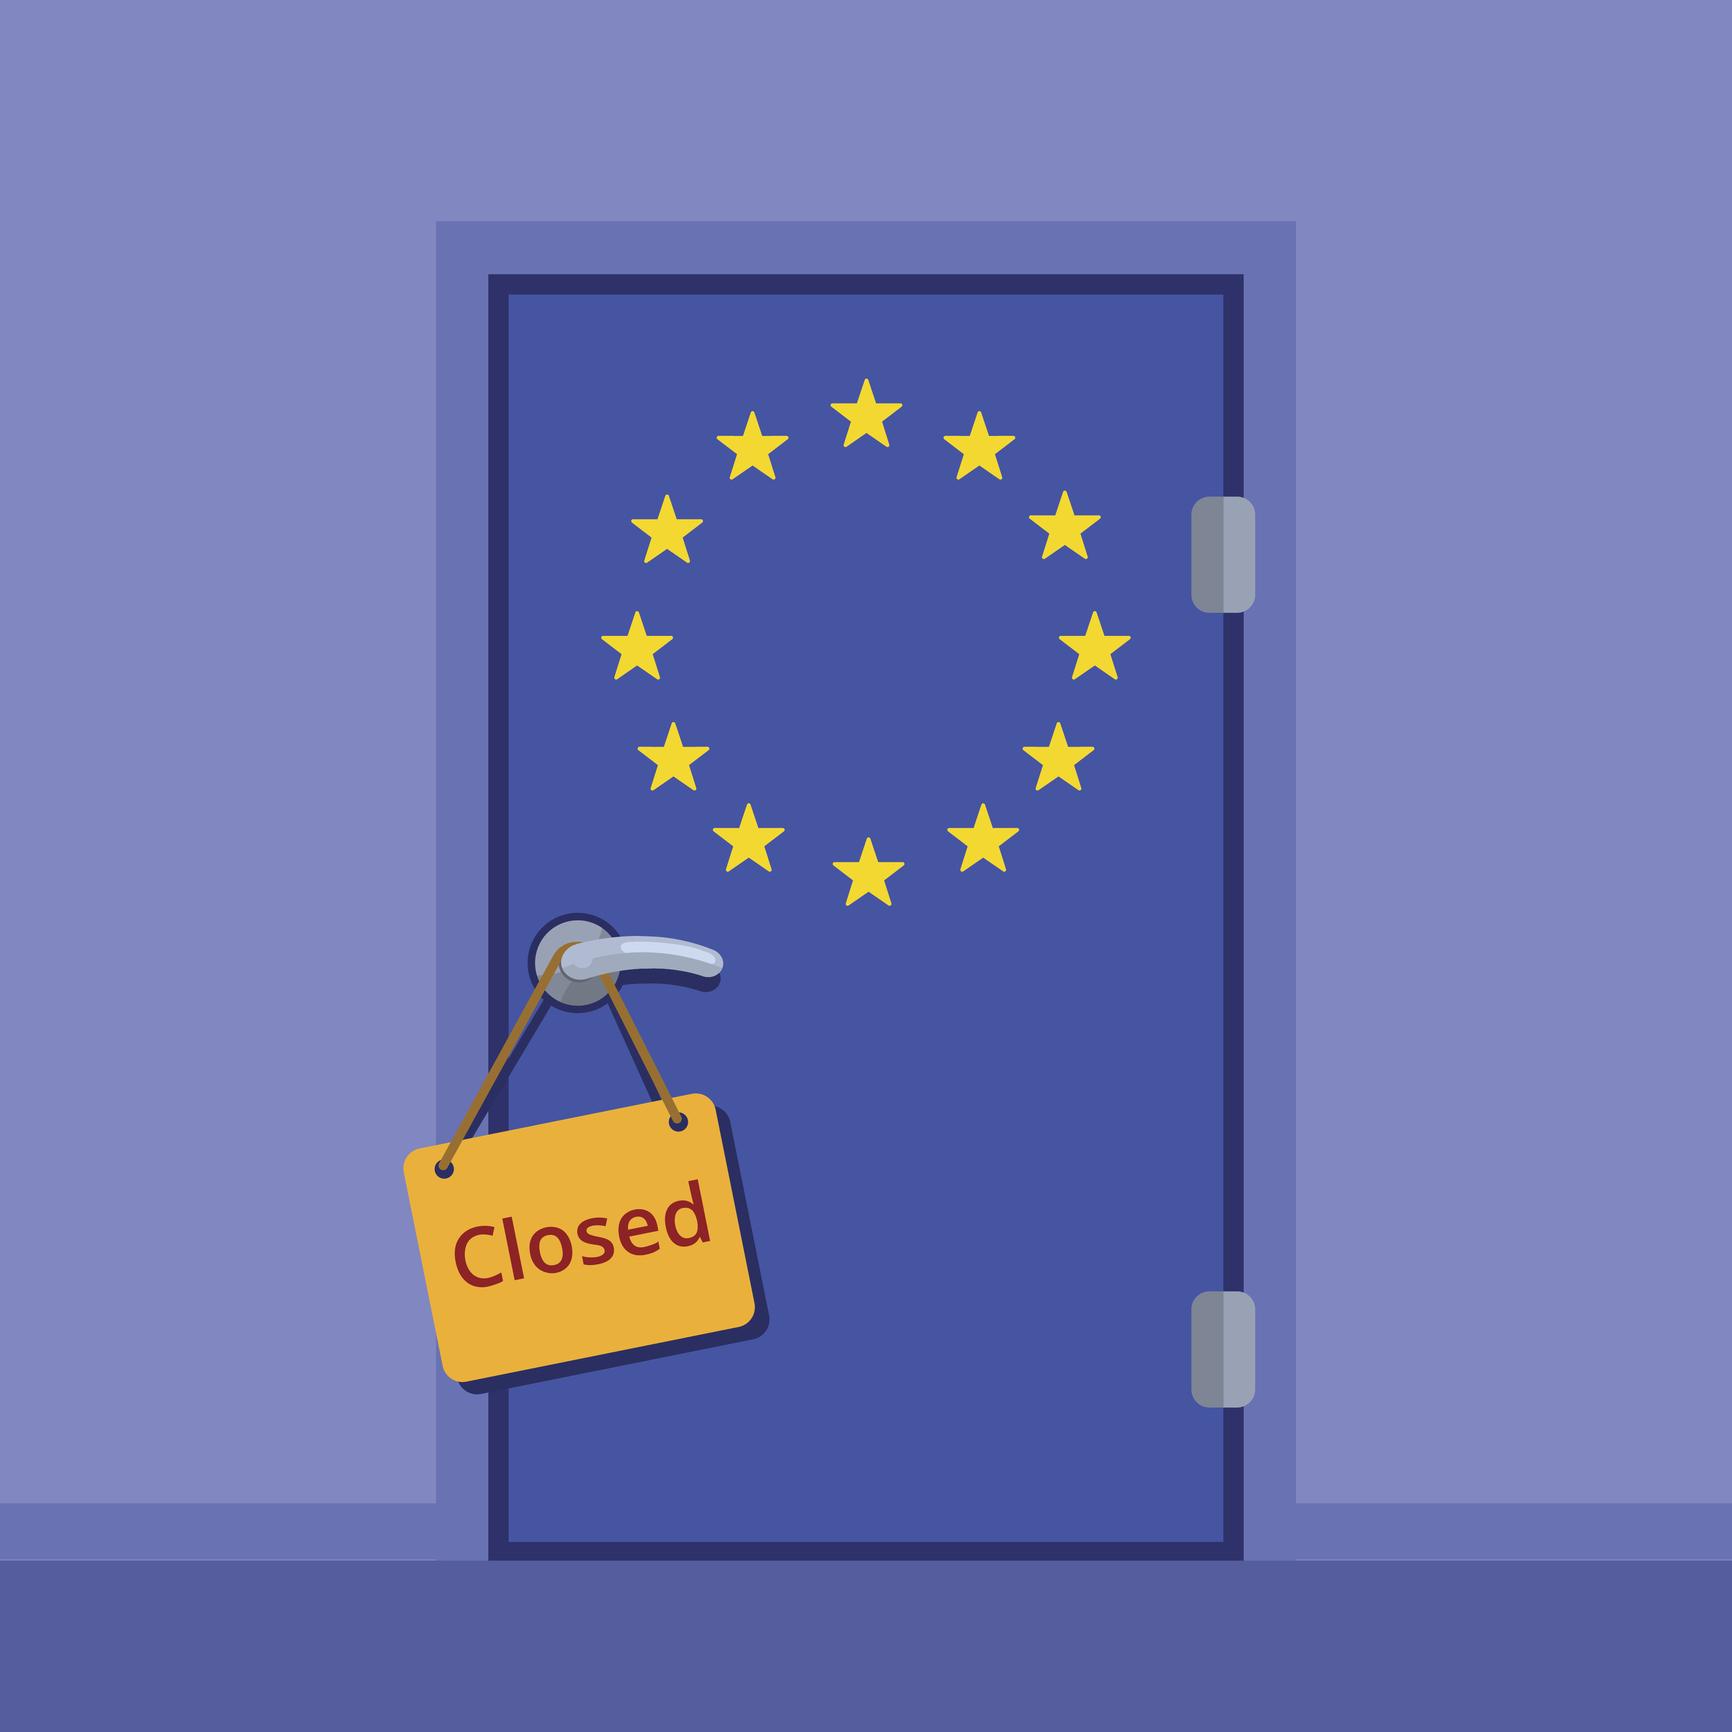 Do not disturb plate on the door handle. European Union closed door flat color vector illustration. EU stars flag cartoon image.